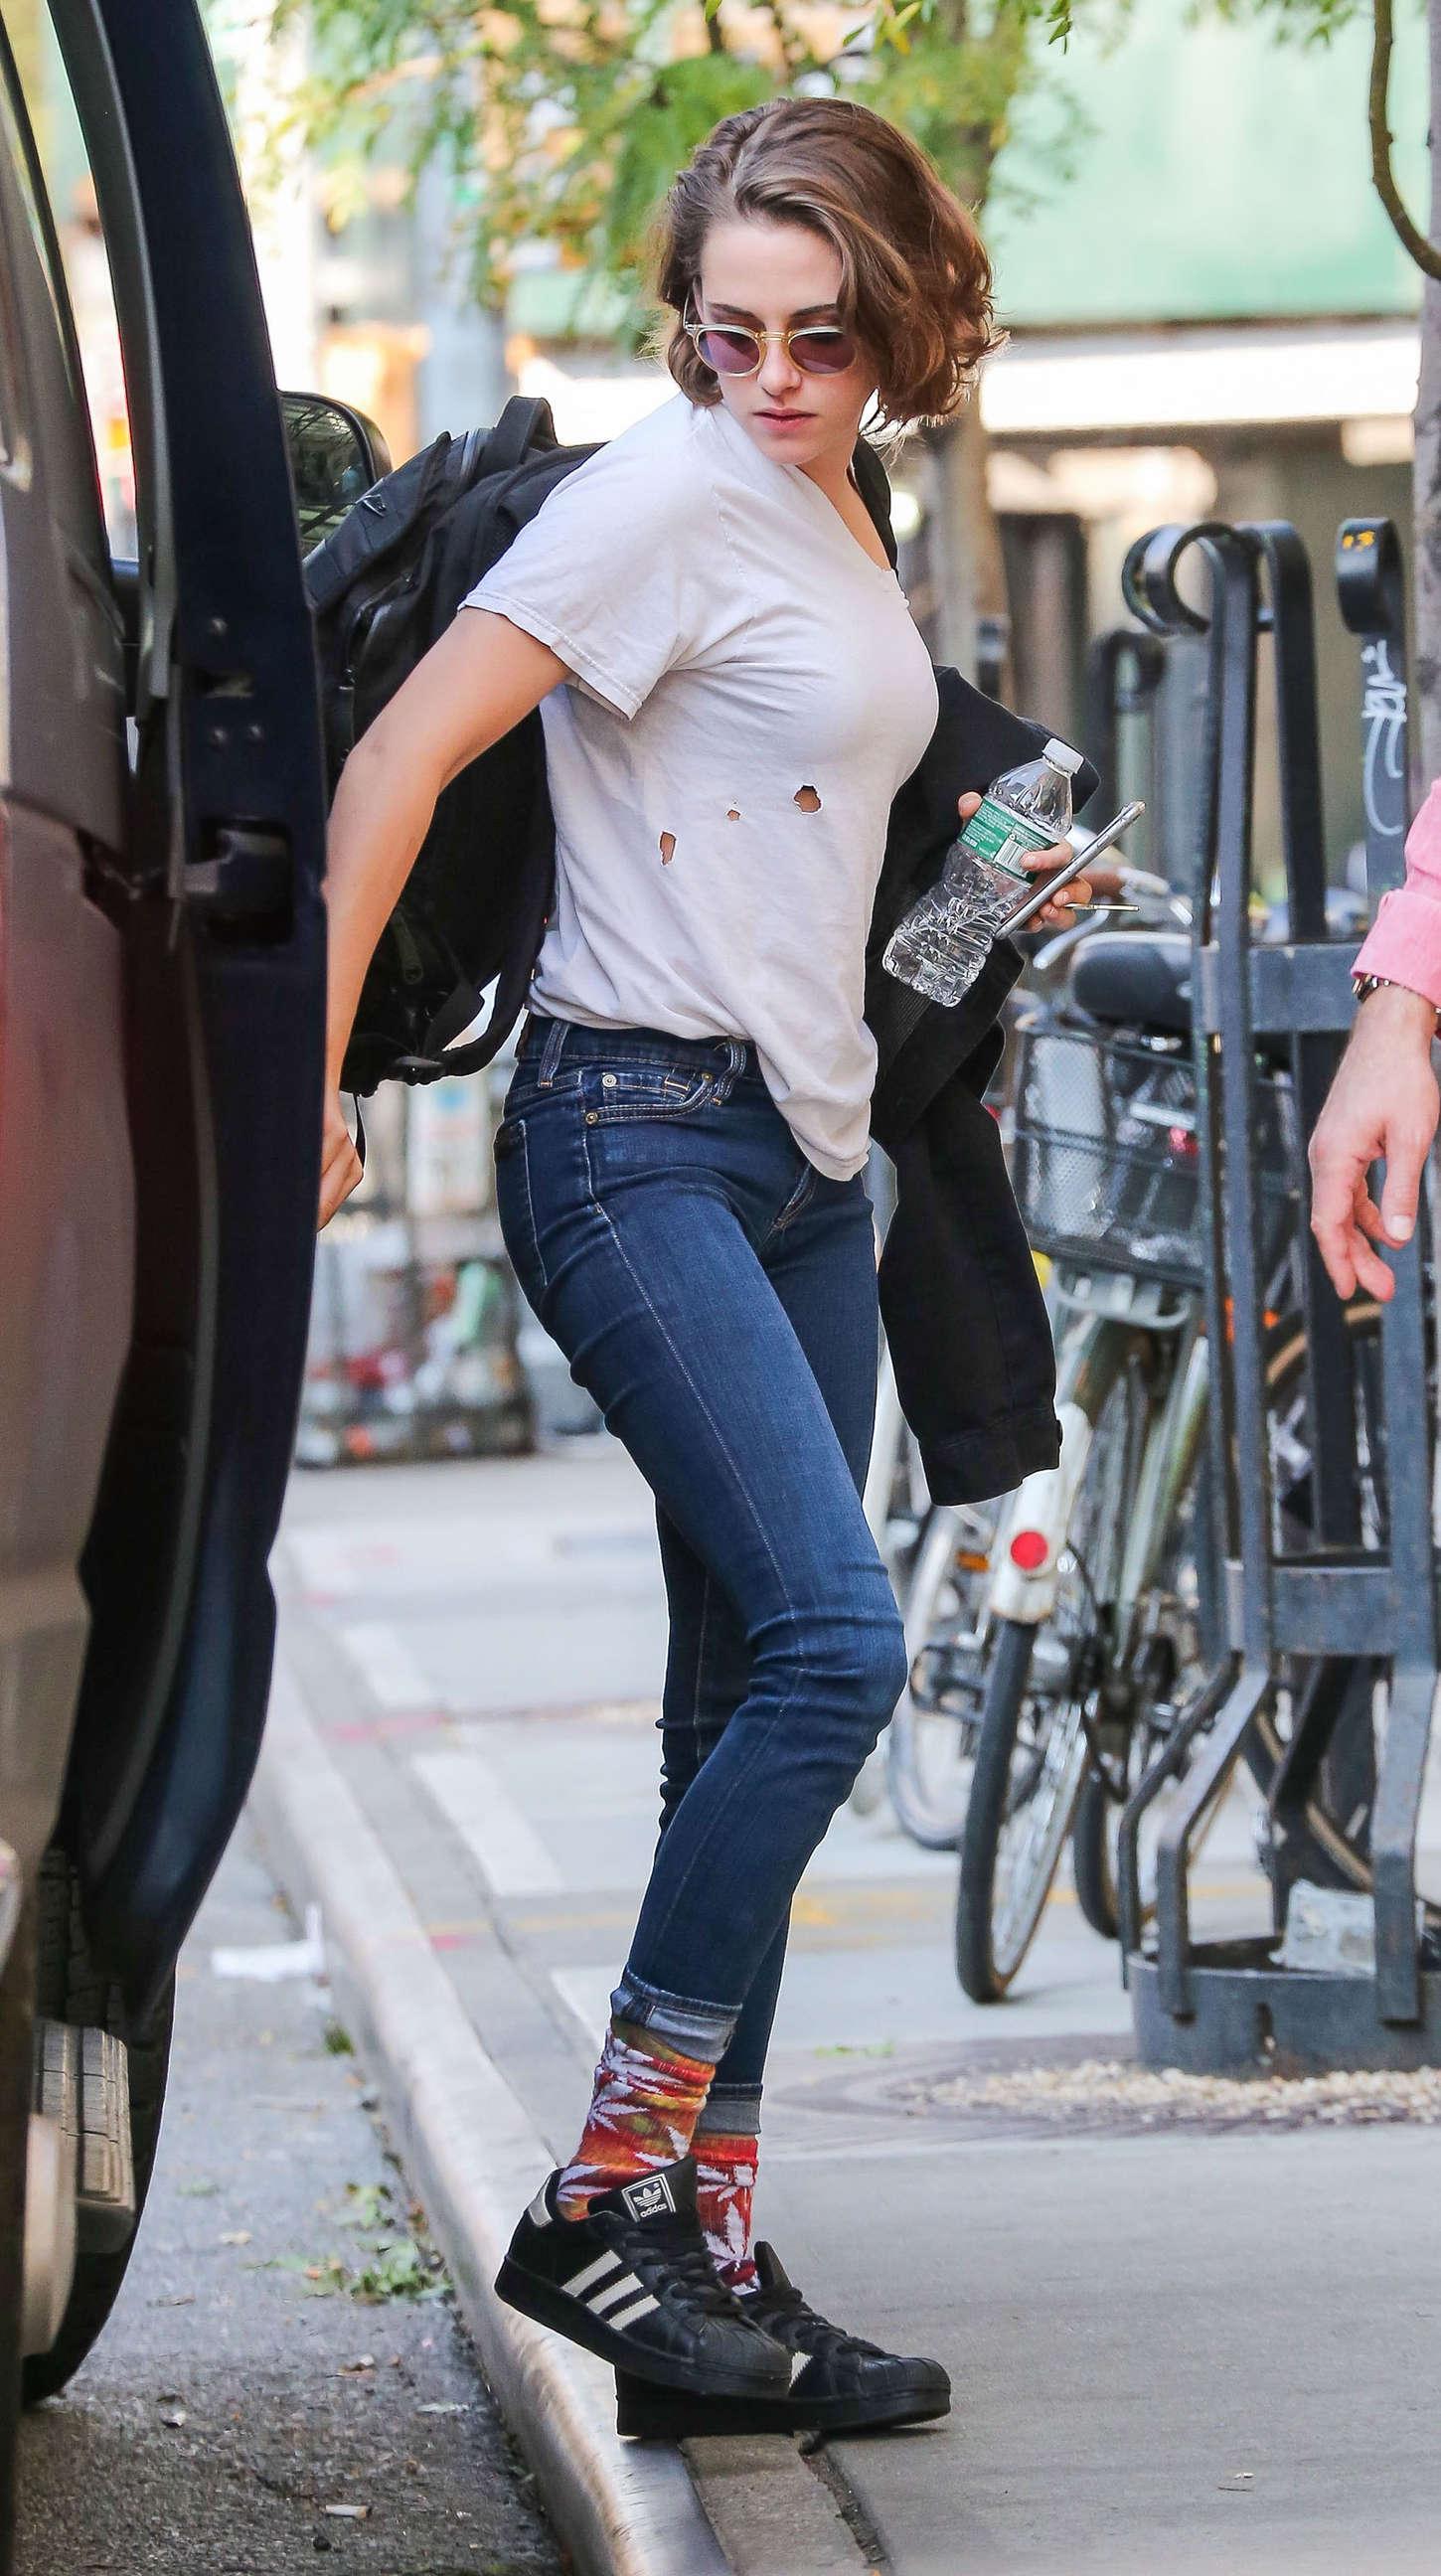 international celebrities kristen stewart in tight jeans